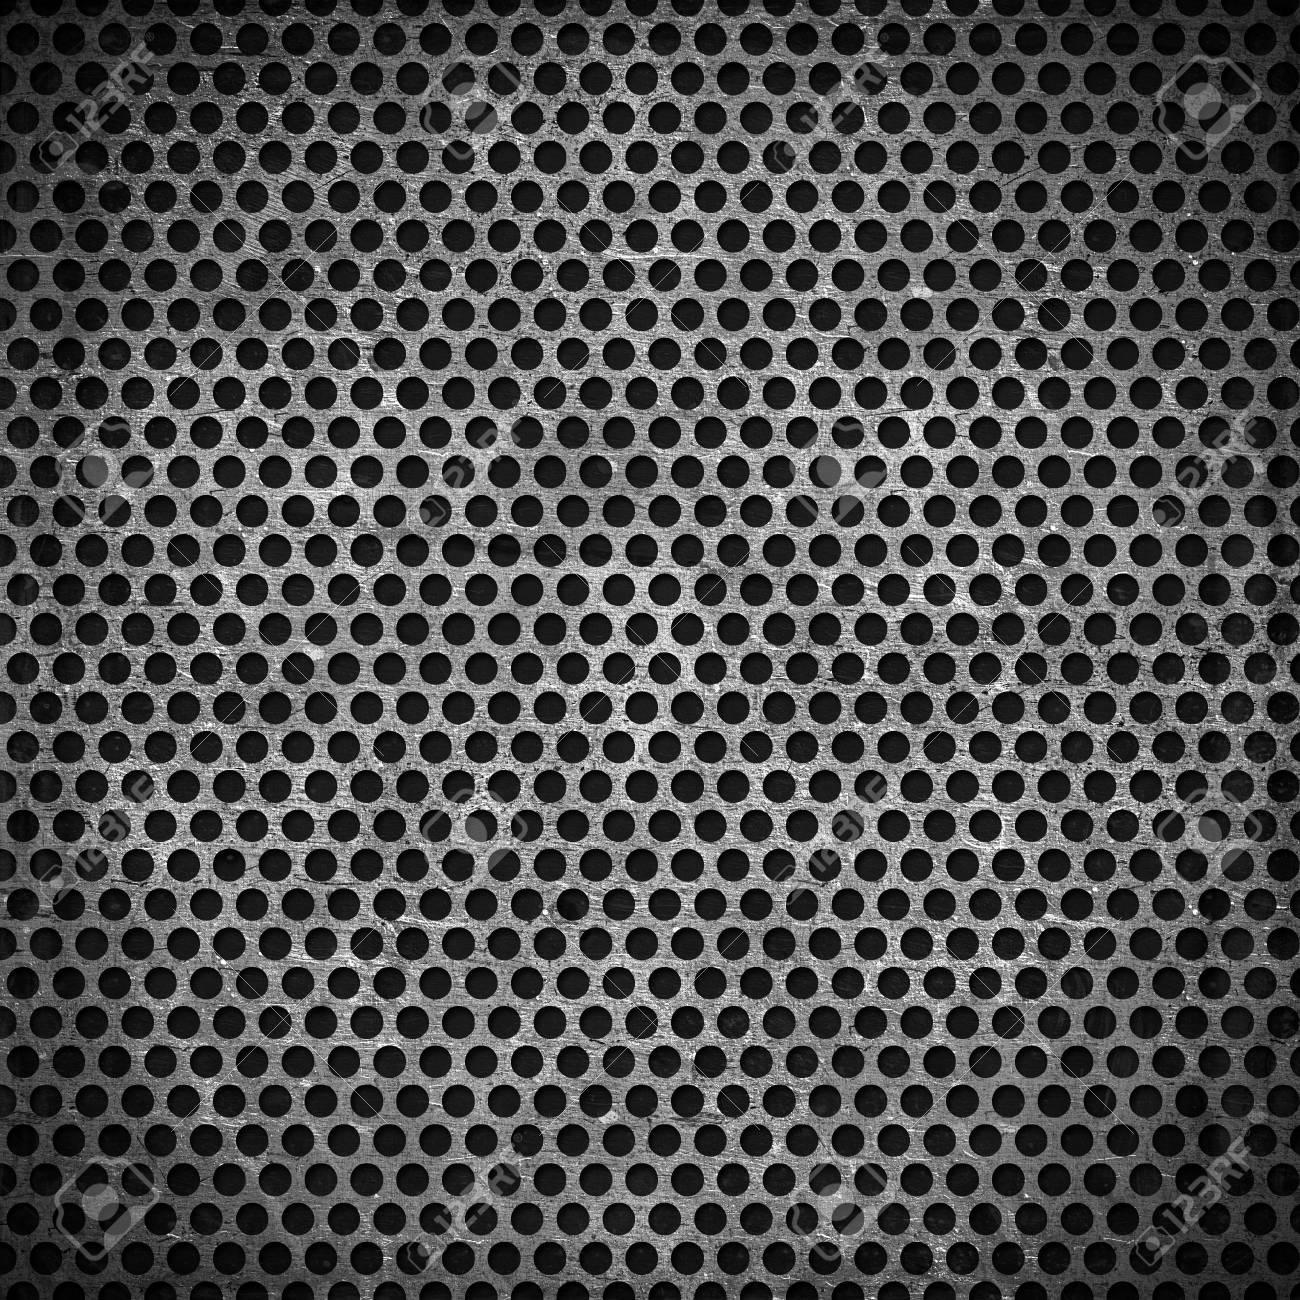 Texture background, metal. Stock Photo - 20324660